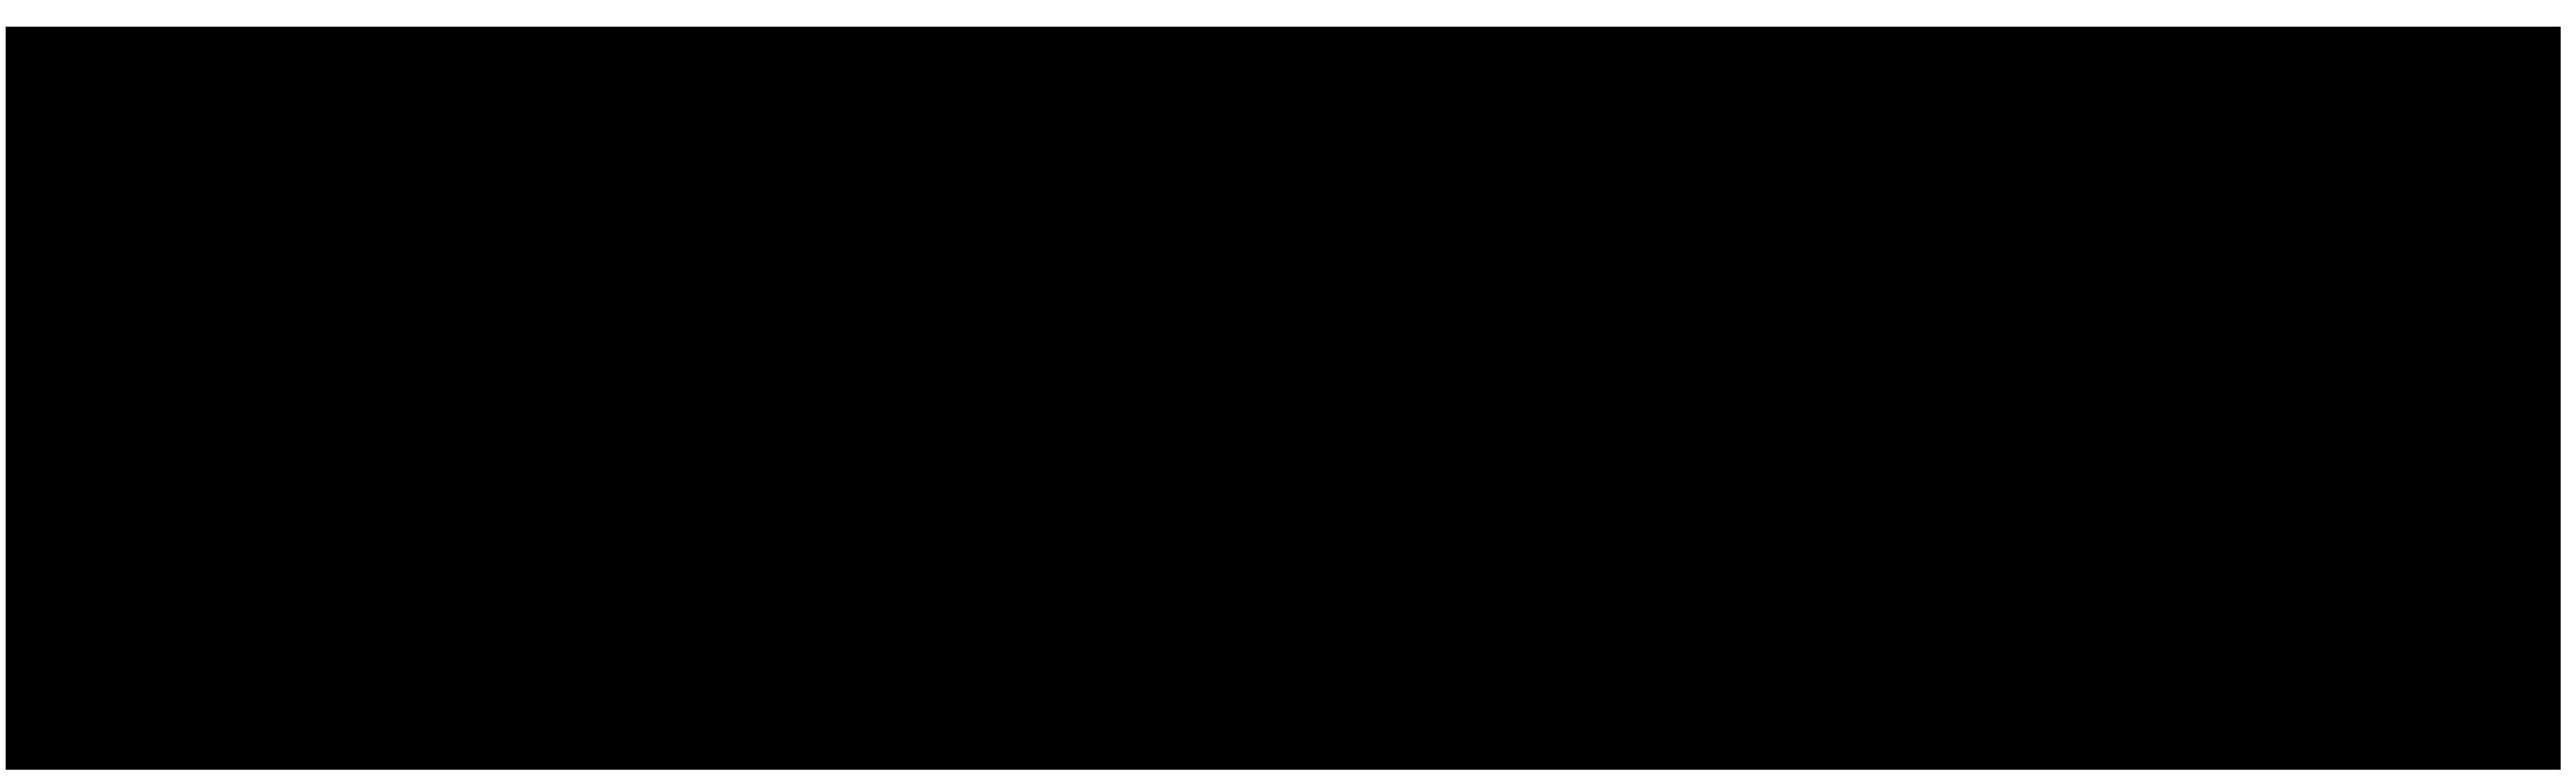 G140 LAYOUT 02